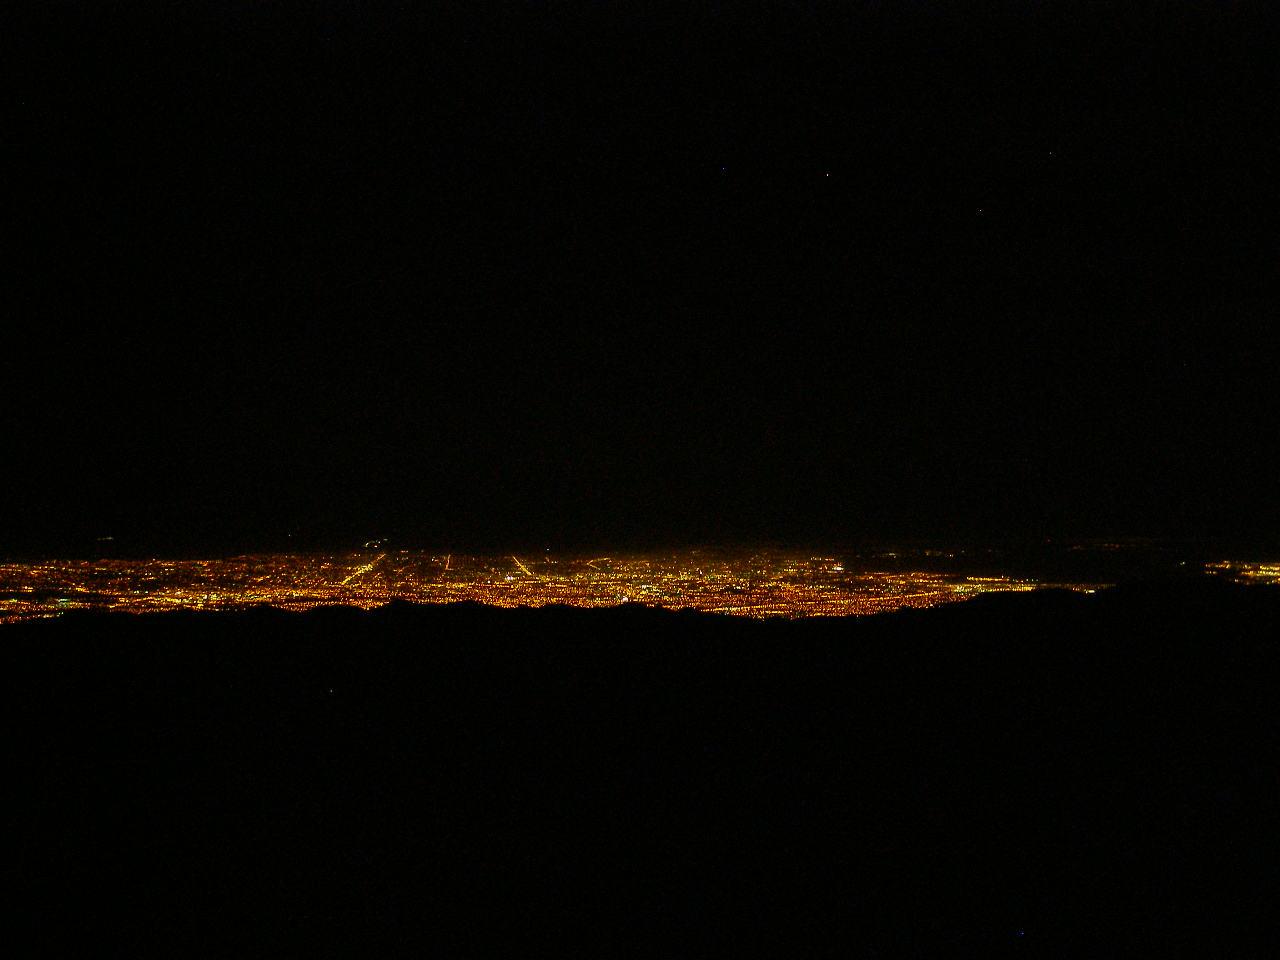 Reid-Hillview RHV ATC Tower audio Learn to Fly San Jose ...